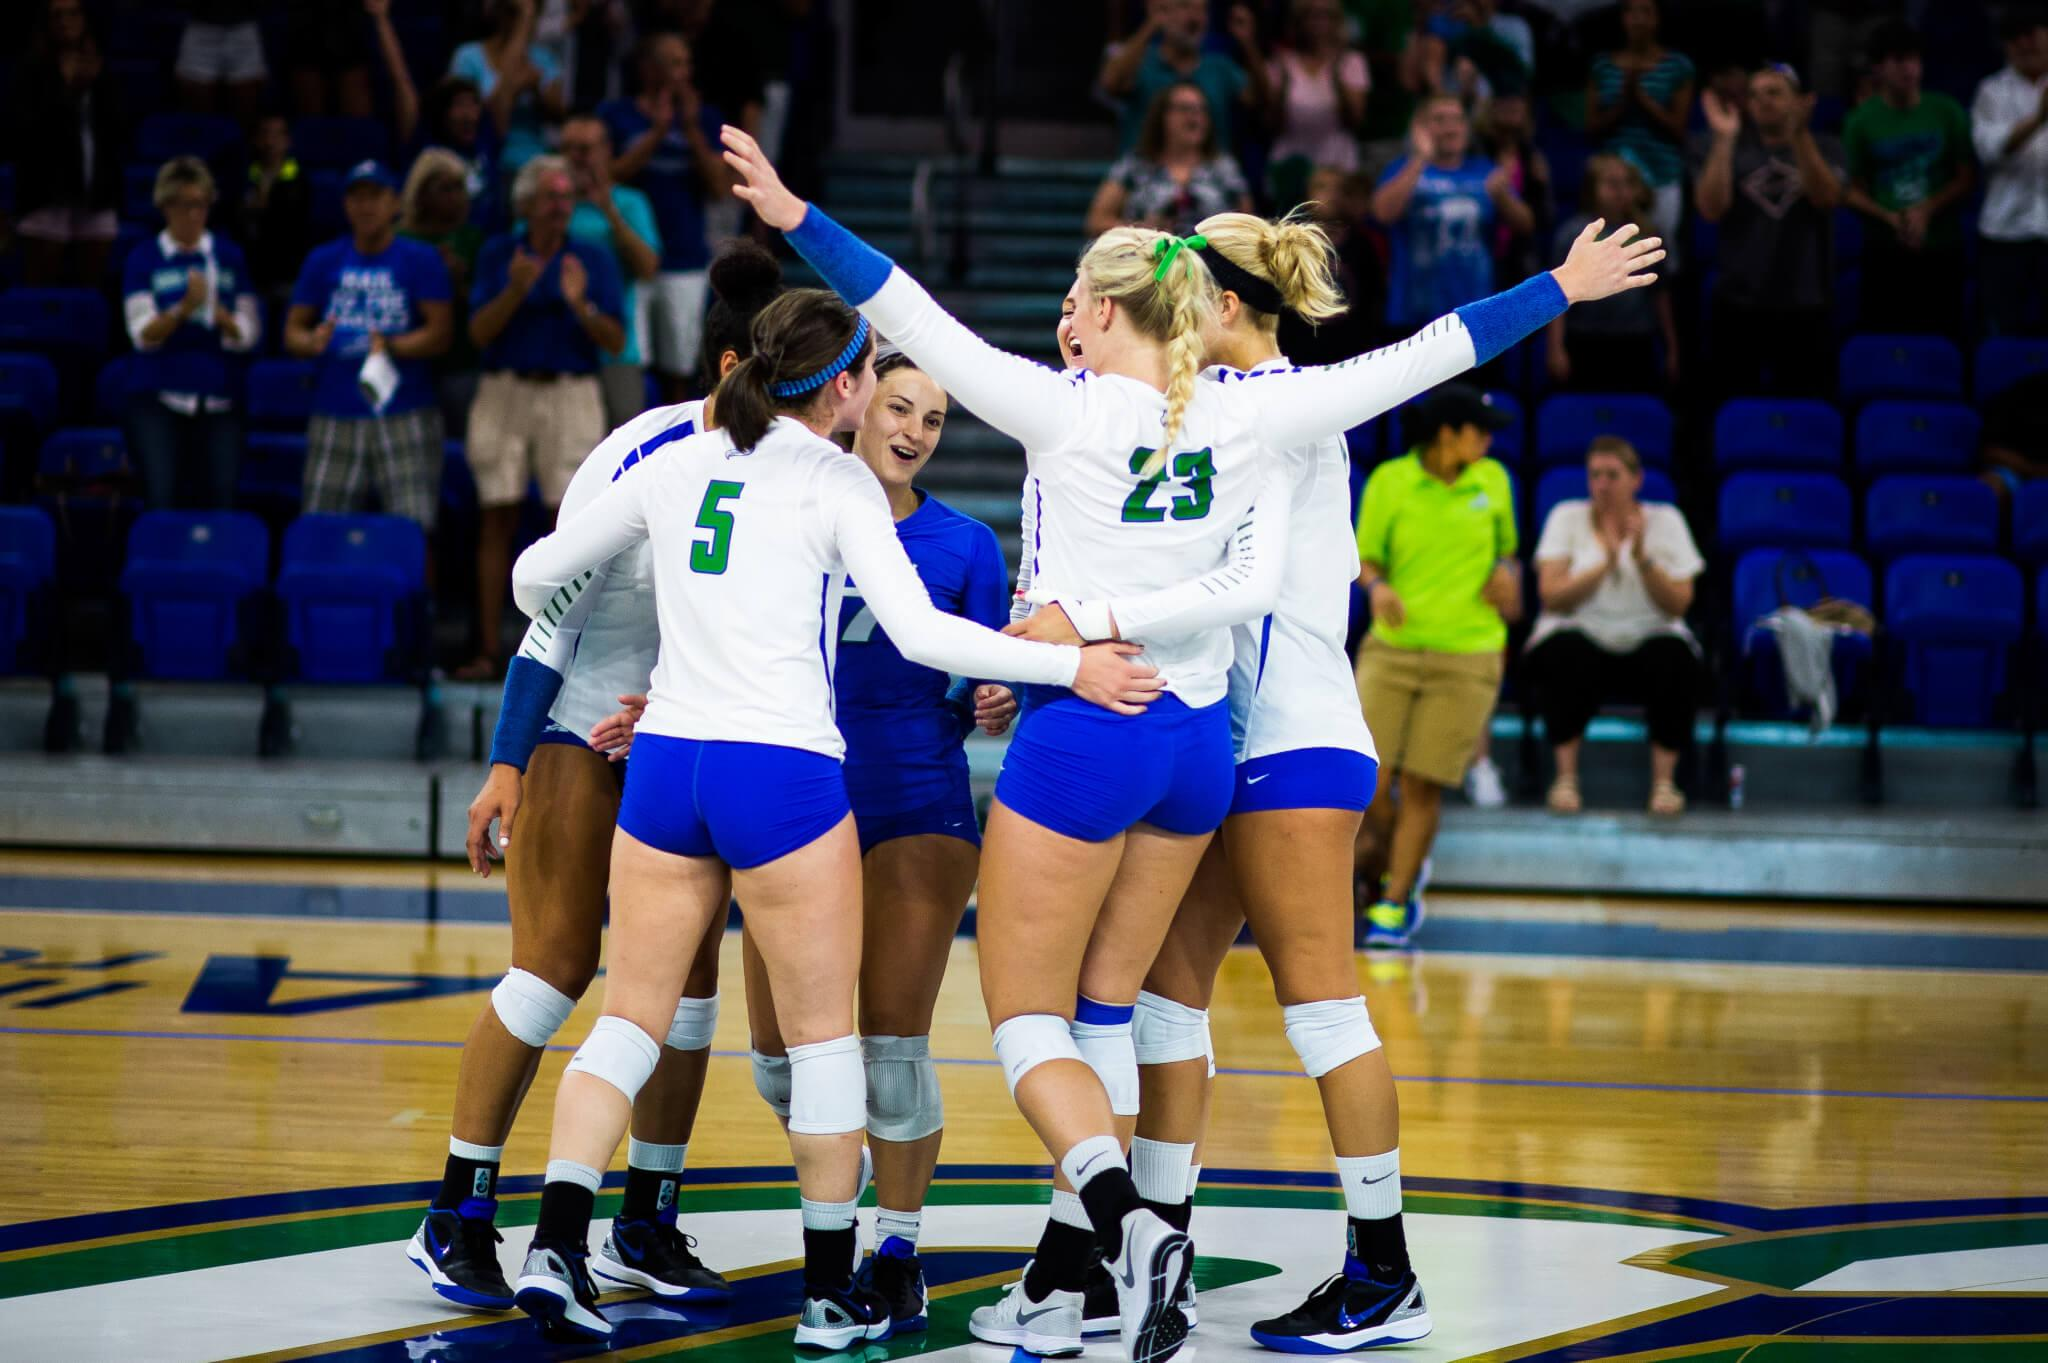 FGCU volleyball earns postseason honors